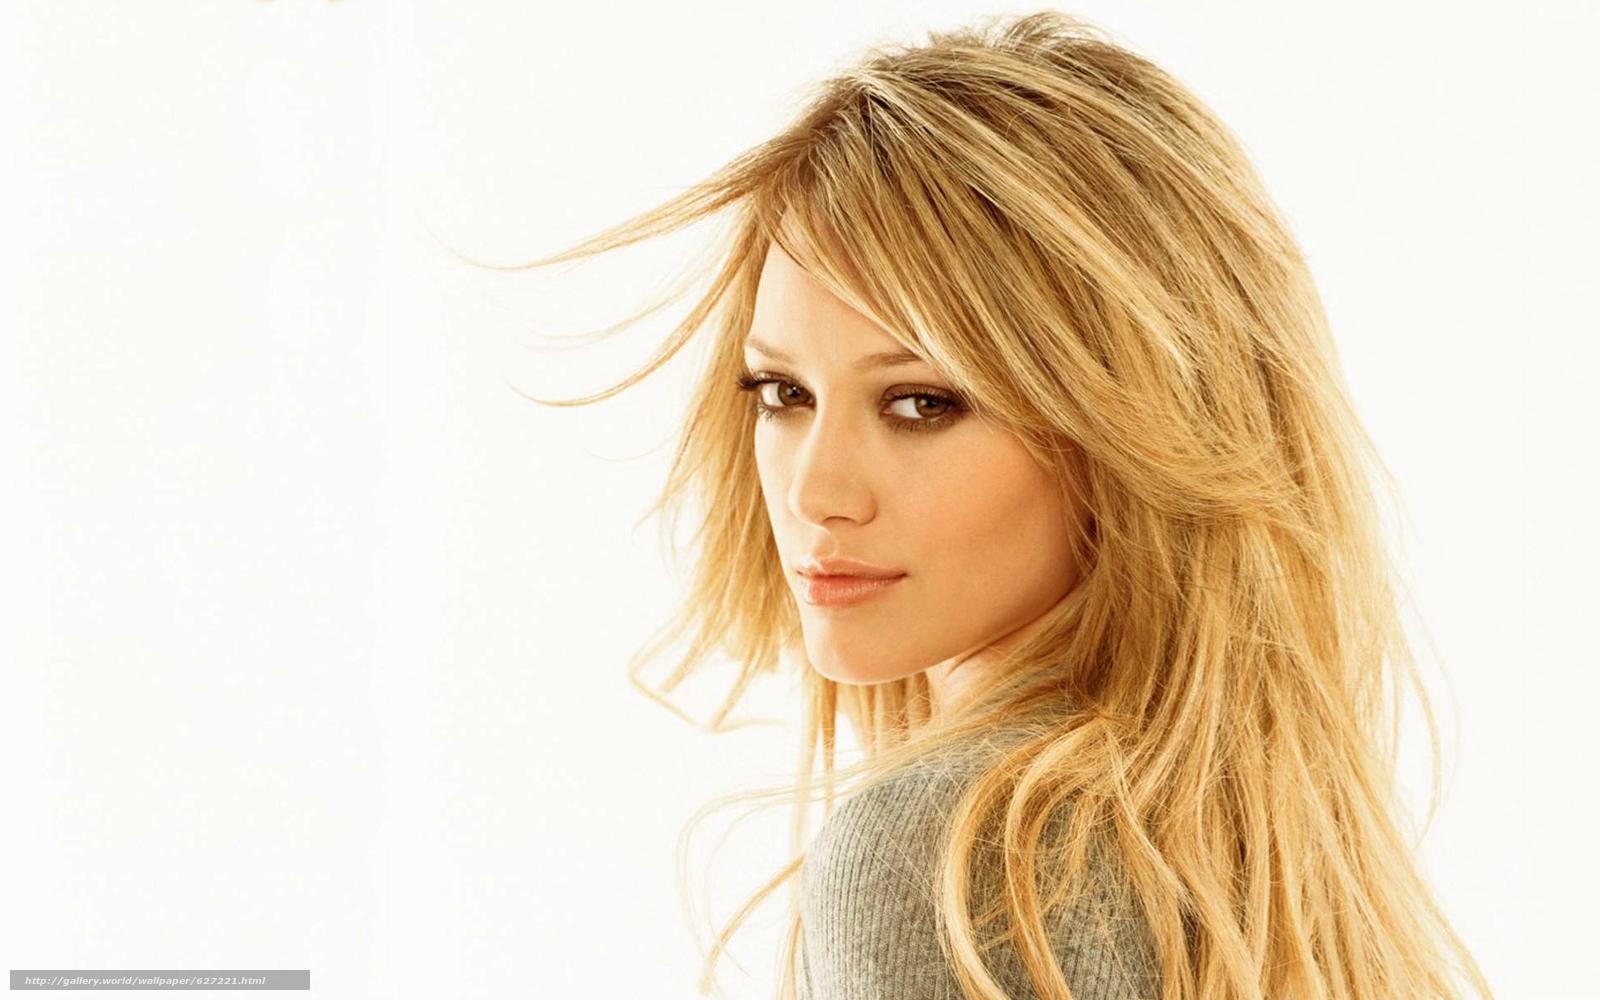 hilary duff, Хи?лари Э?рхард Дафф, Hilary Erhard Duff, американская актриса, певица, предприниматель, модель, продюсер